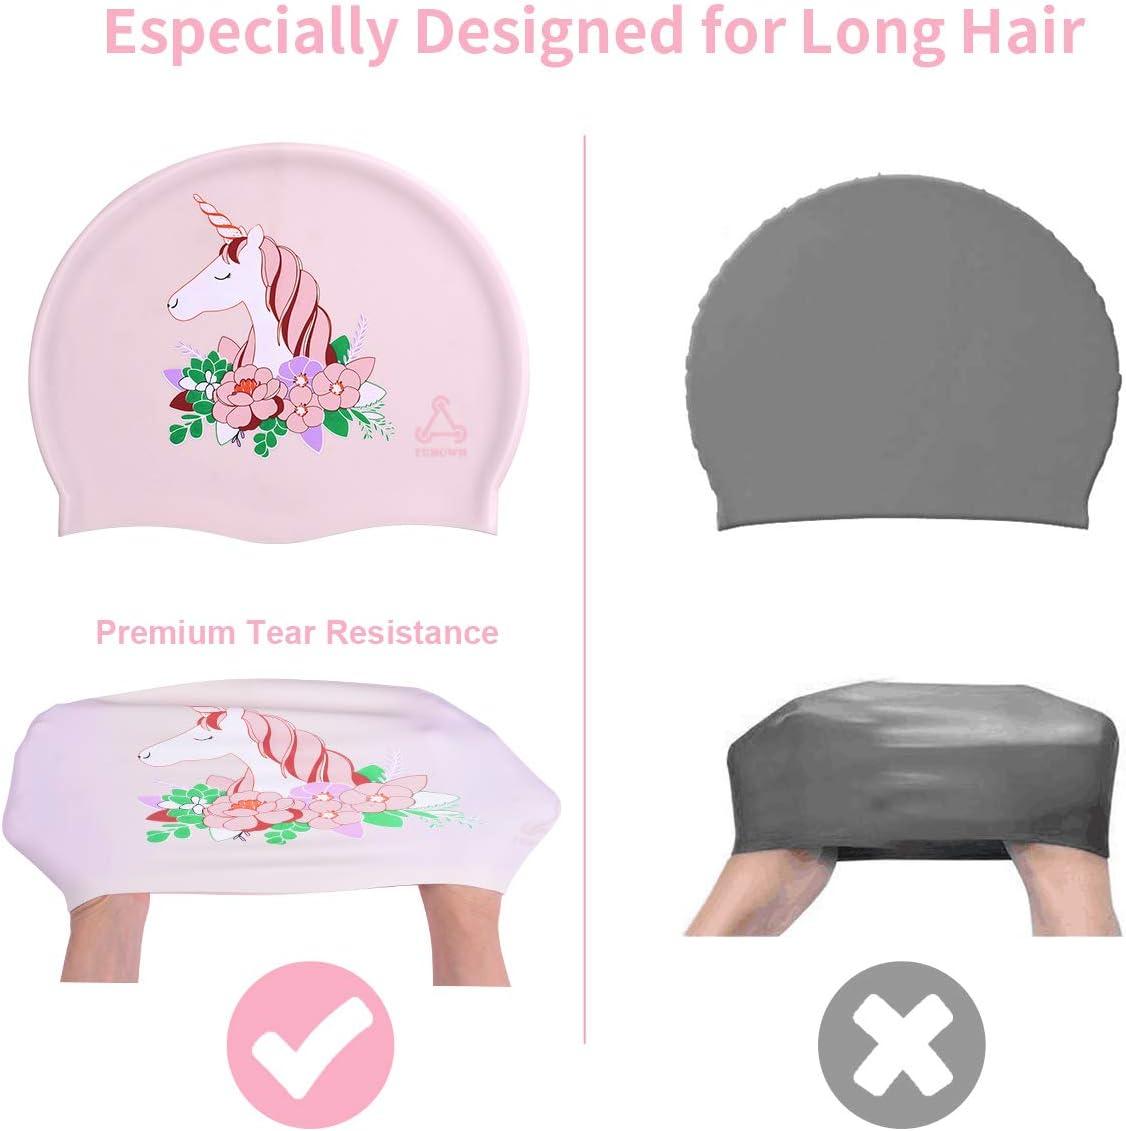 Swimming Cap 3D Ergonomic Design Comfortable Durable Ear Protection for Women Kids Men Adults Boys Girls for Long or Short Hair with Unicorn Design FUNOWN Swim Caps for Women